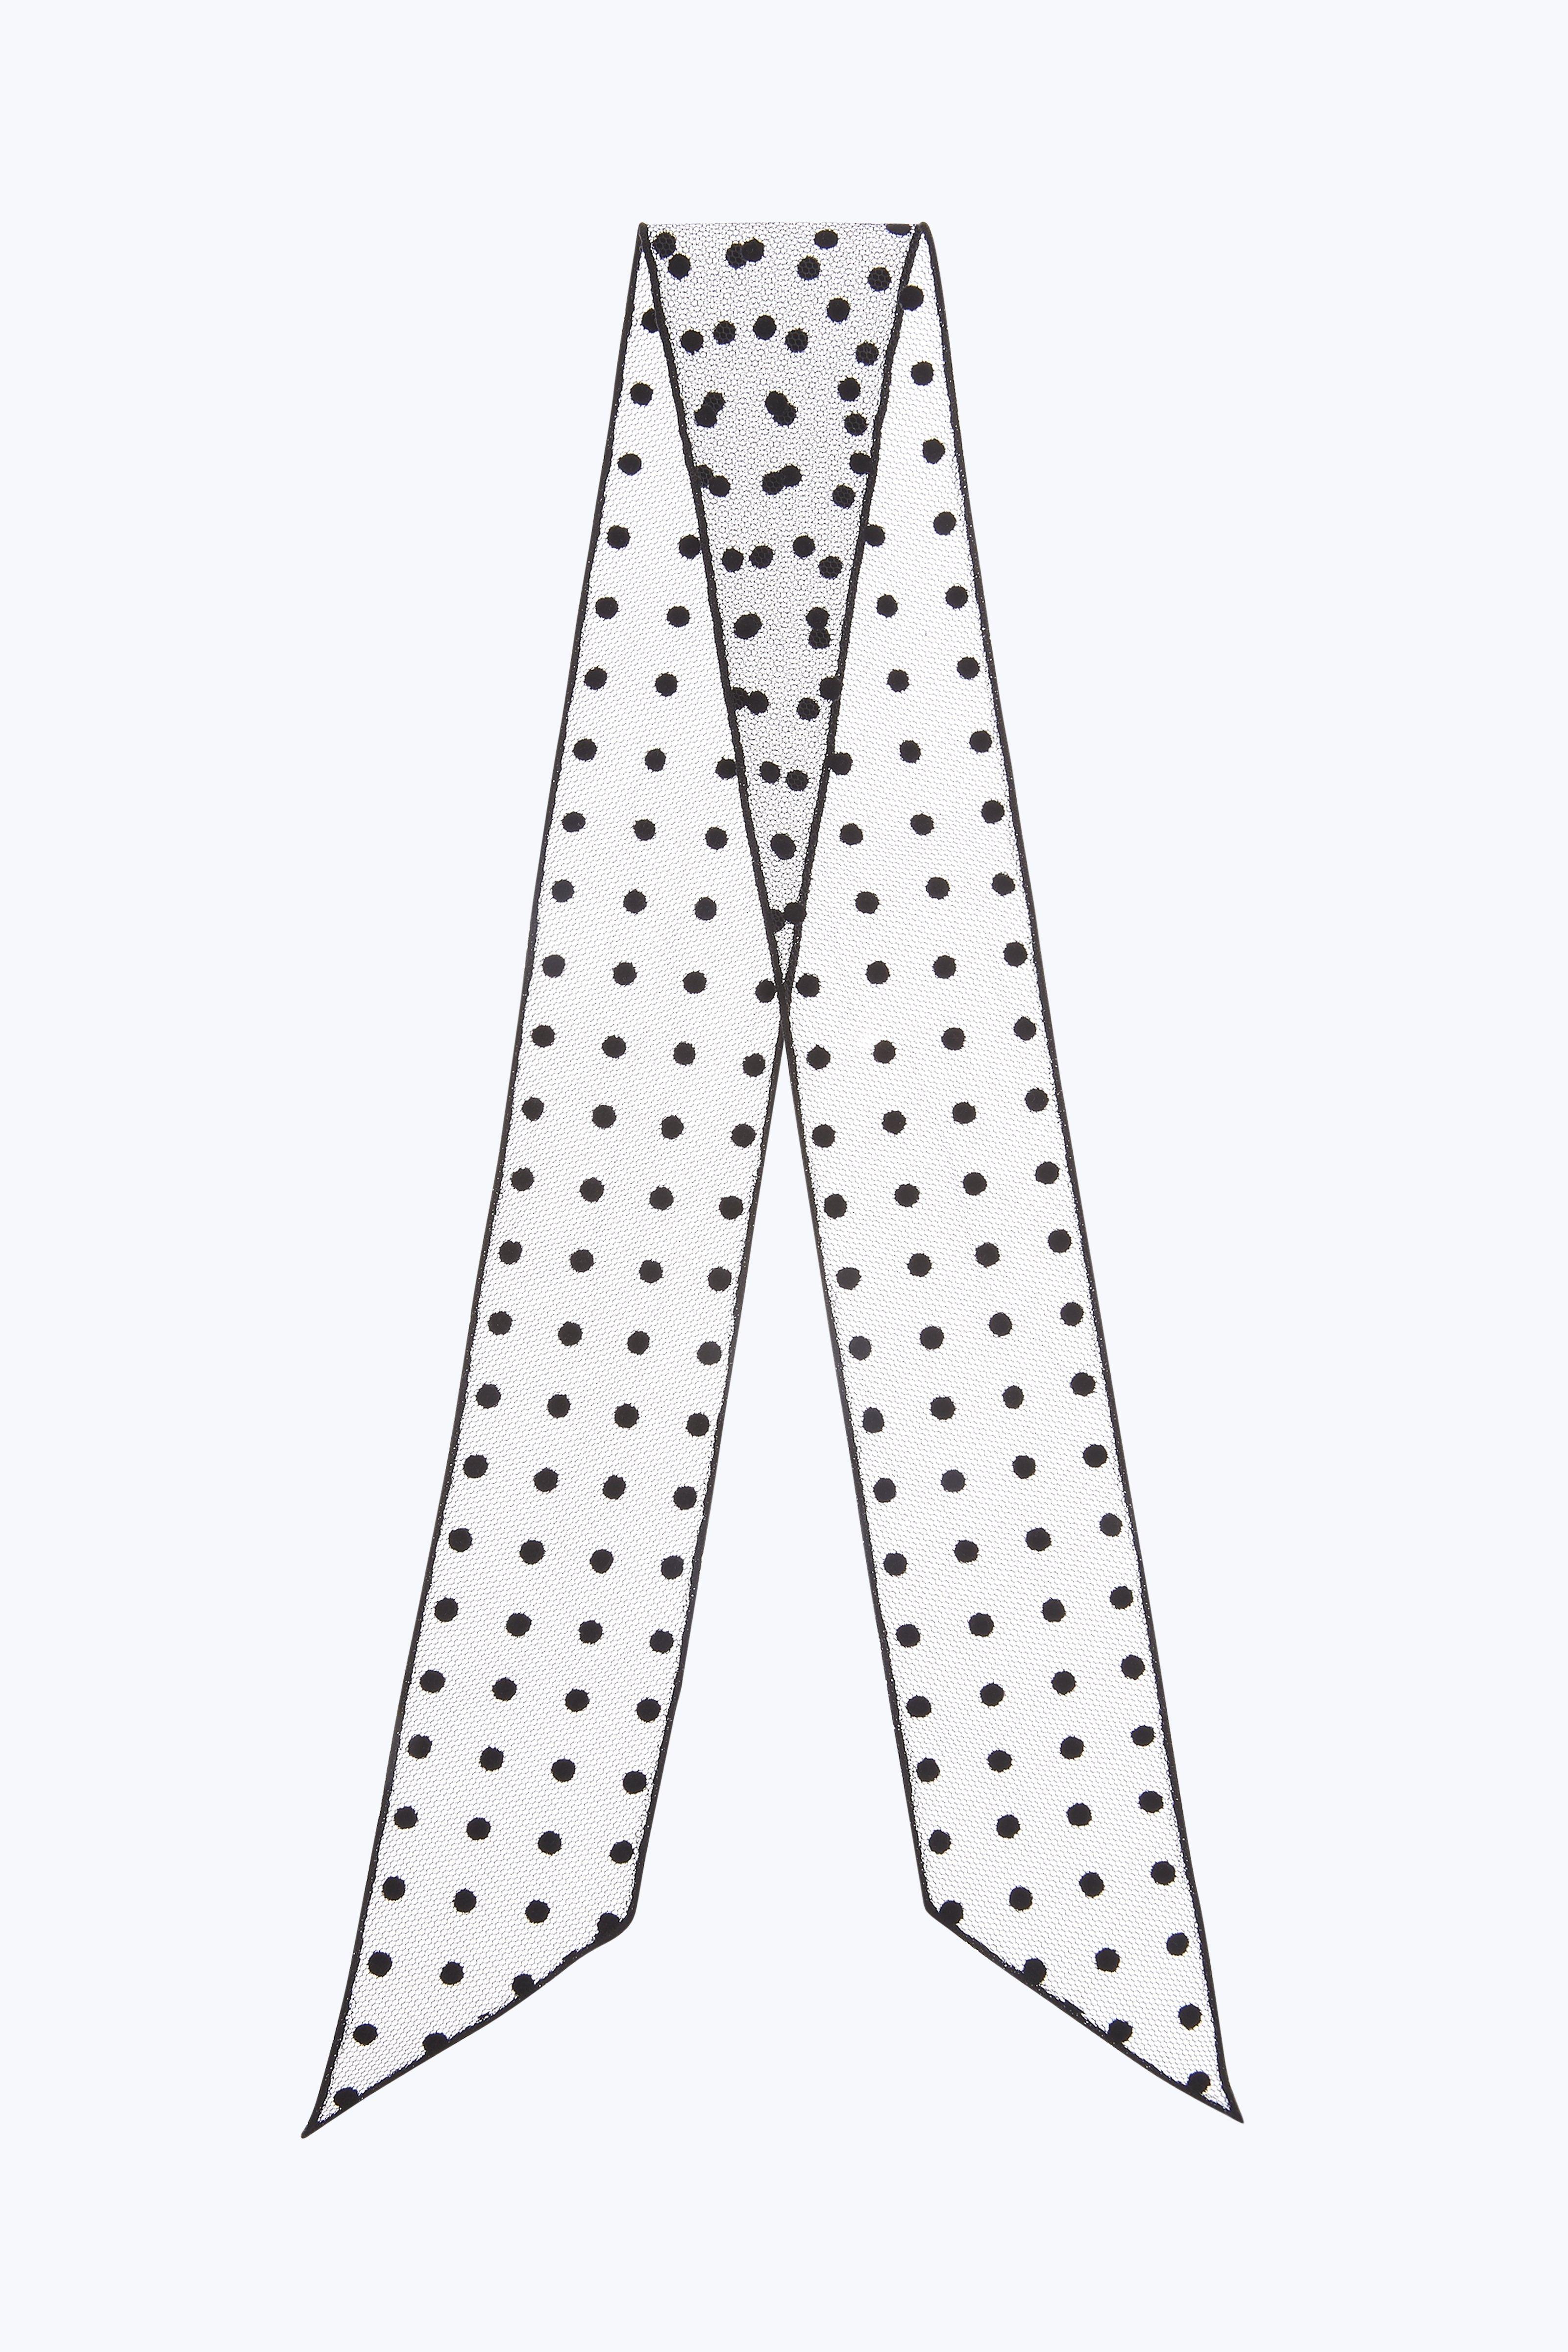 Marc Jacobs Polka Dot Flocked Mini Bandeau In Black Multi